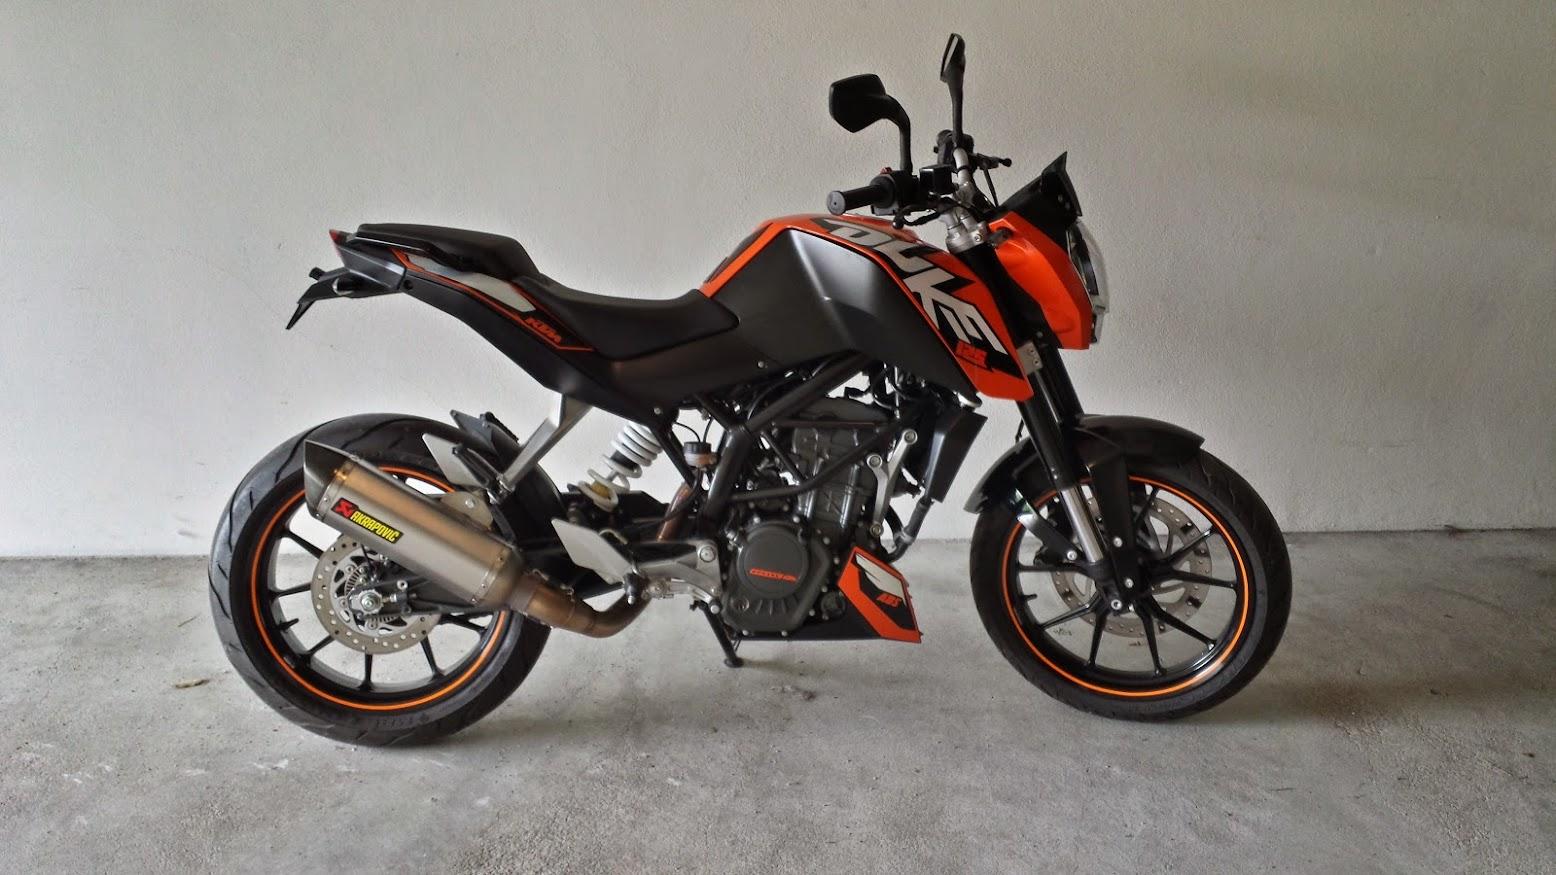 KTM Duke 125 ABS 20140705_125423_Richtone%28HDR%29